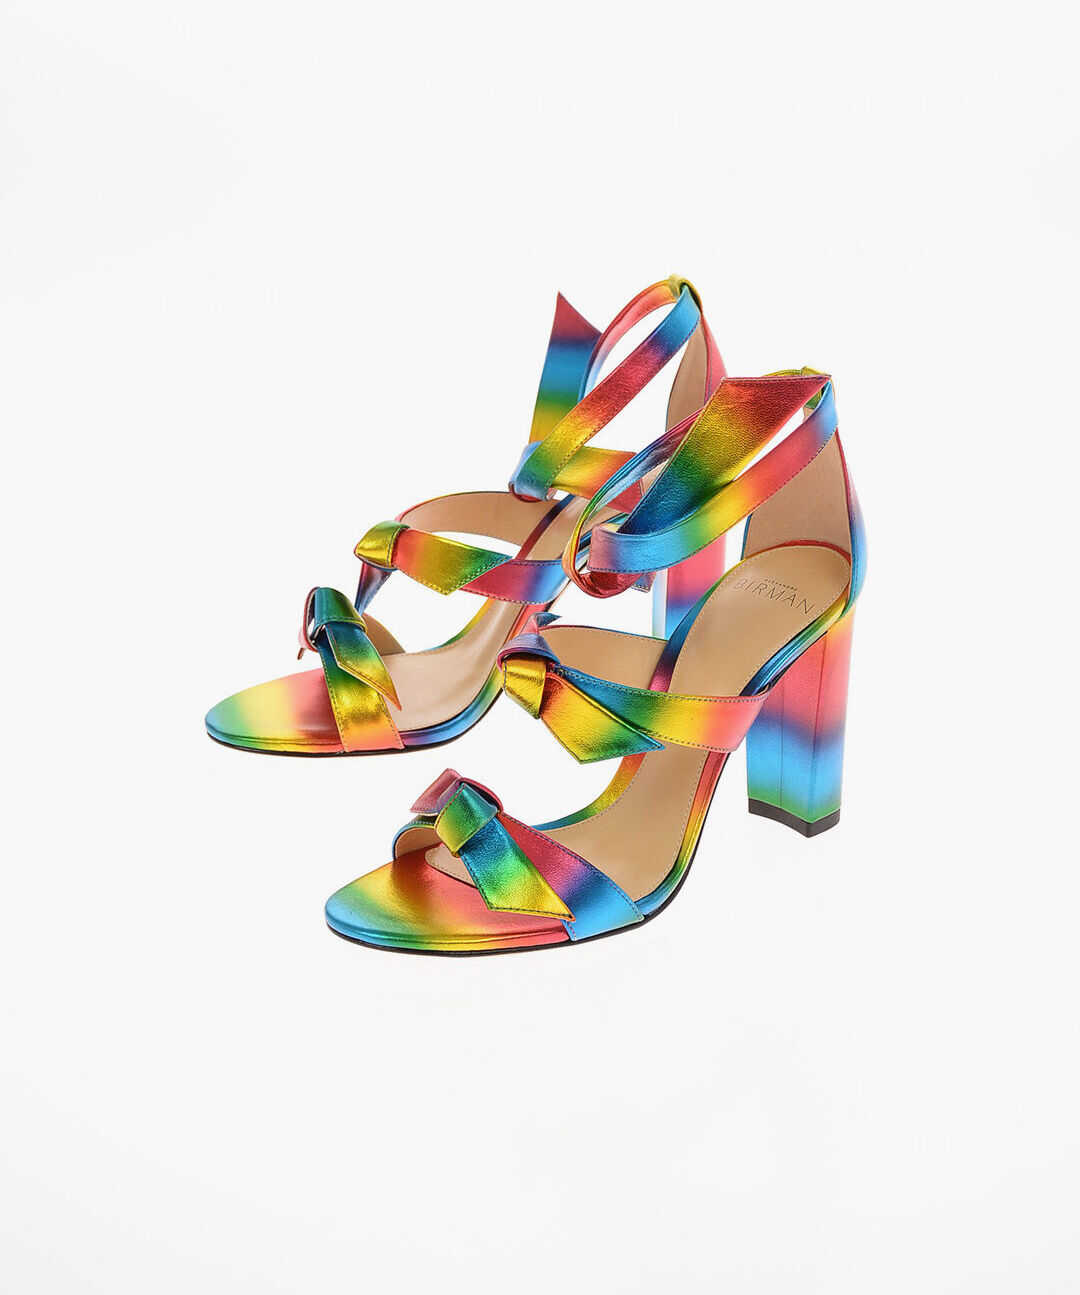 Alexandre Birman 9cm leather GIANNA BLOCK 90 Ankle-strap sandals MULTICOLOR imagine b-mall.ro